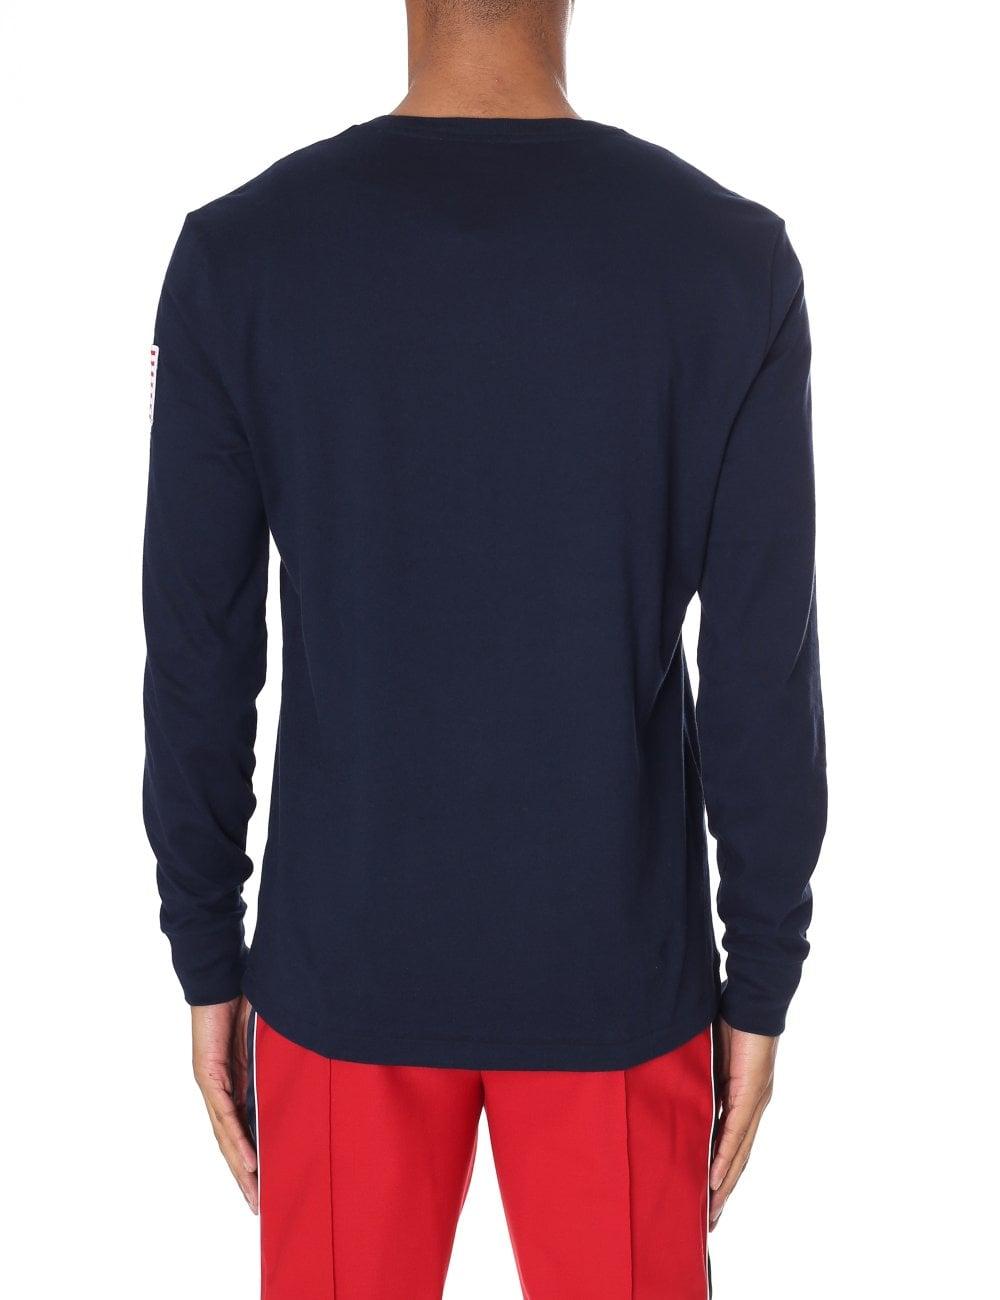 feac64f96884 Polo Ralph Lauren Men s Custom Slim Fit Long Sleeve Tee